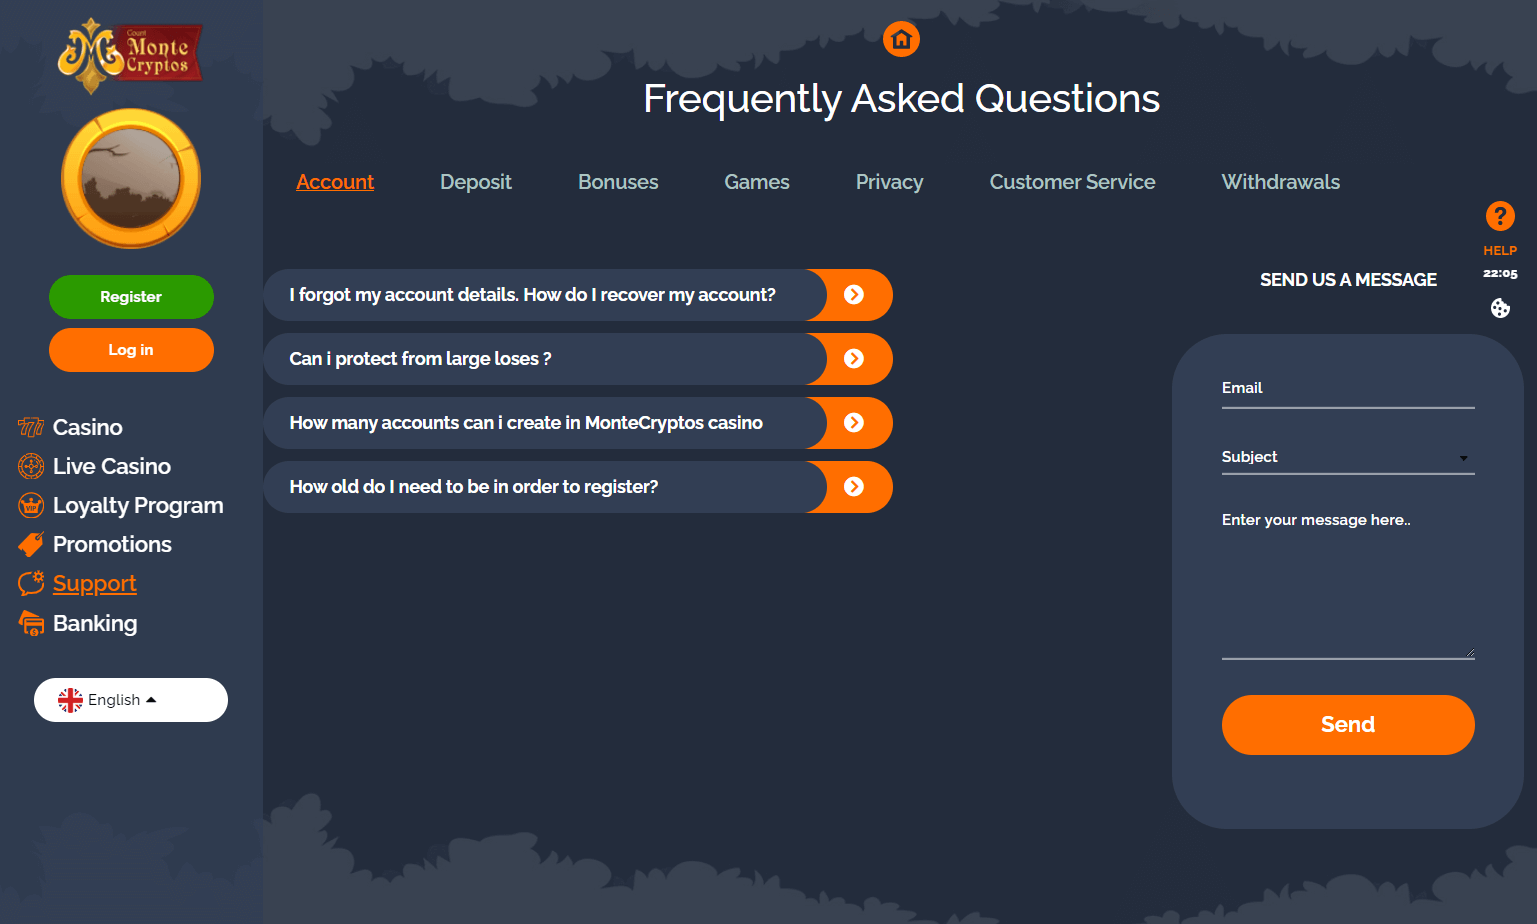 MonteCryptos Casino FAQ